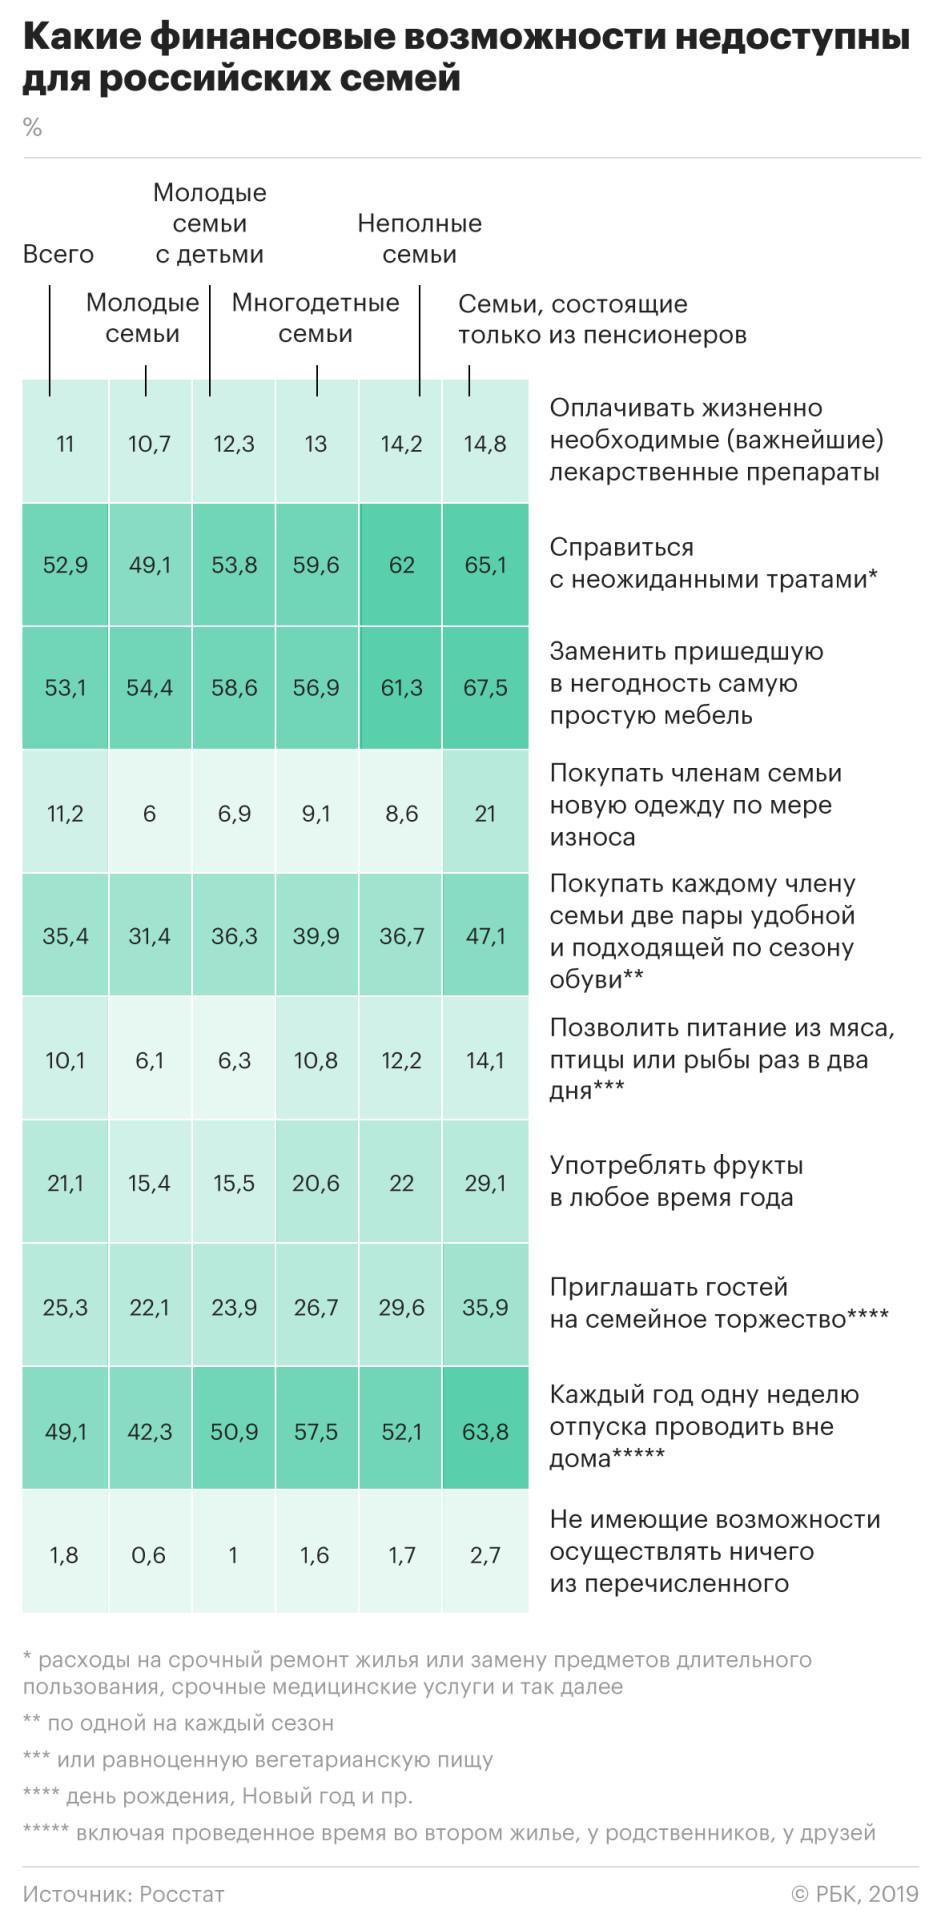 https://s0.rbk.ru/v6_top_pics/resized/945xH/media/img/6/94/755542257750946.jpeg